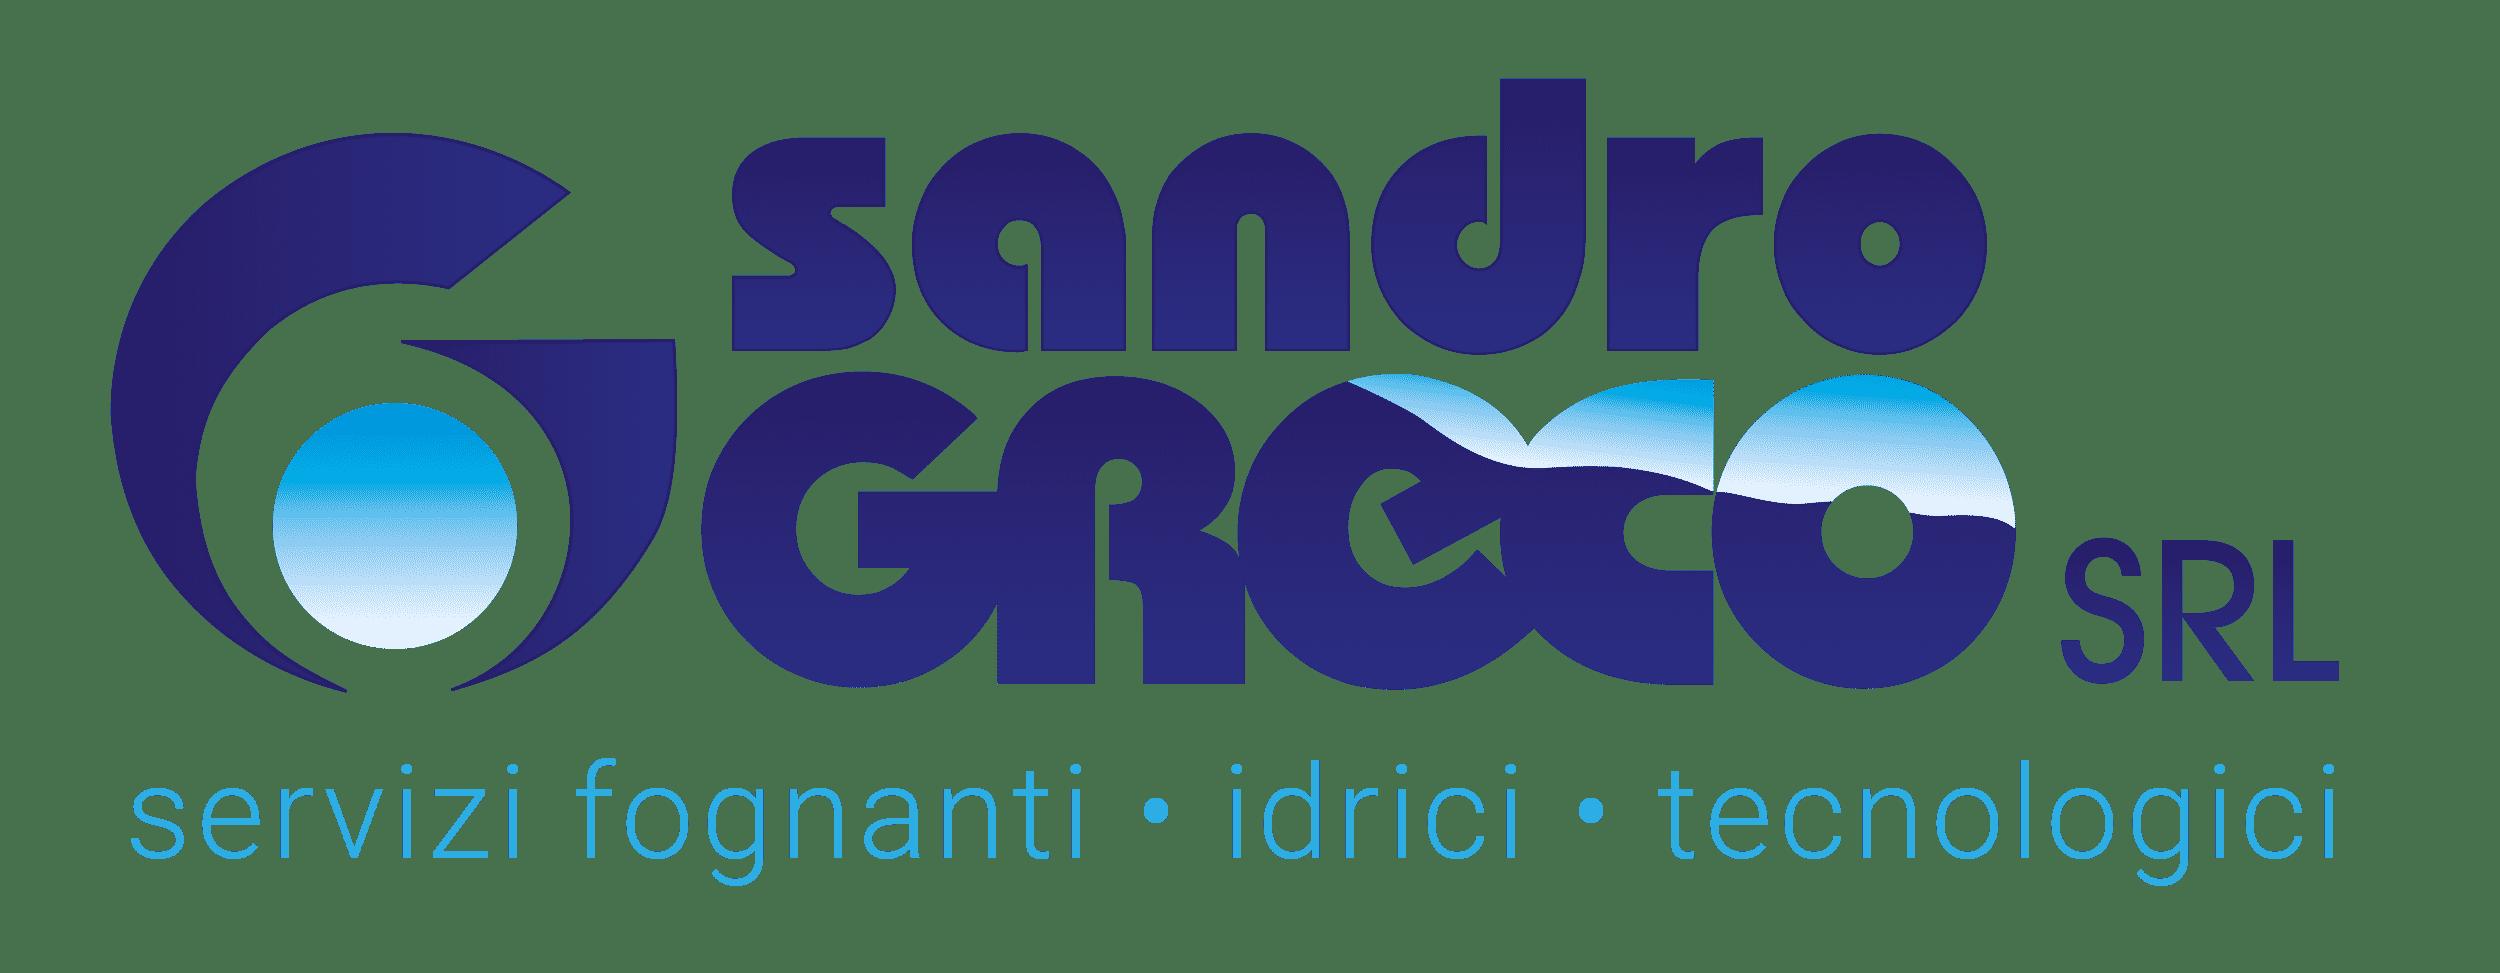 logo sandrogreco • Blog